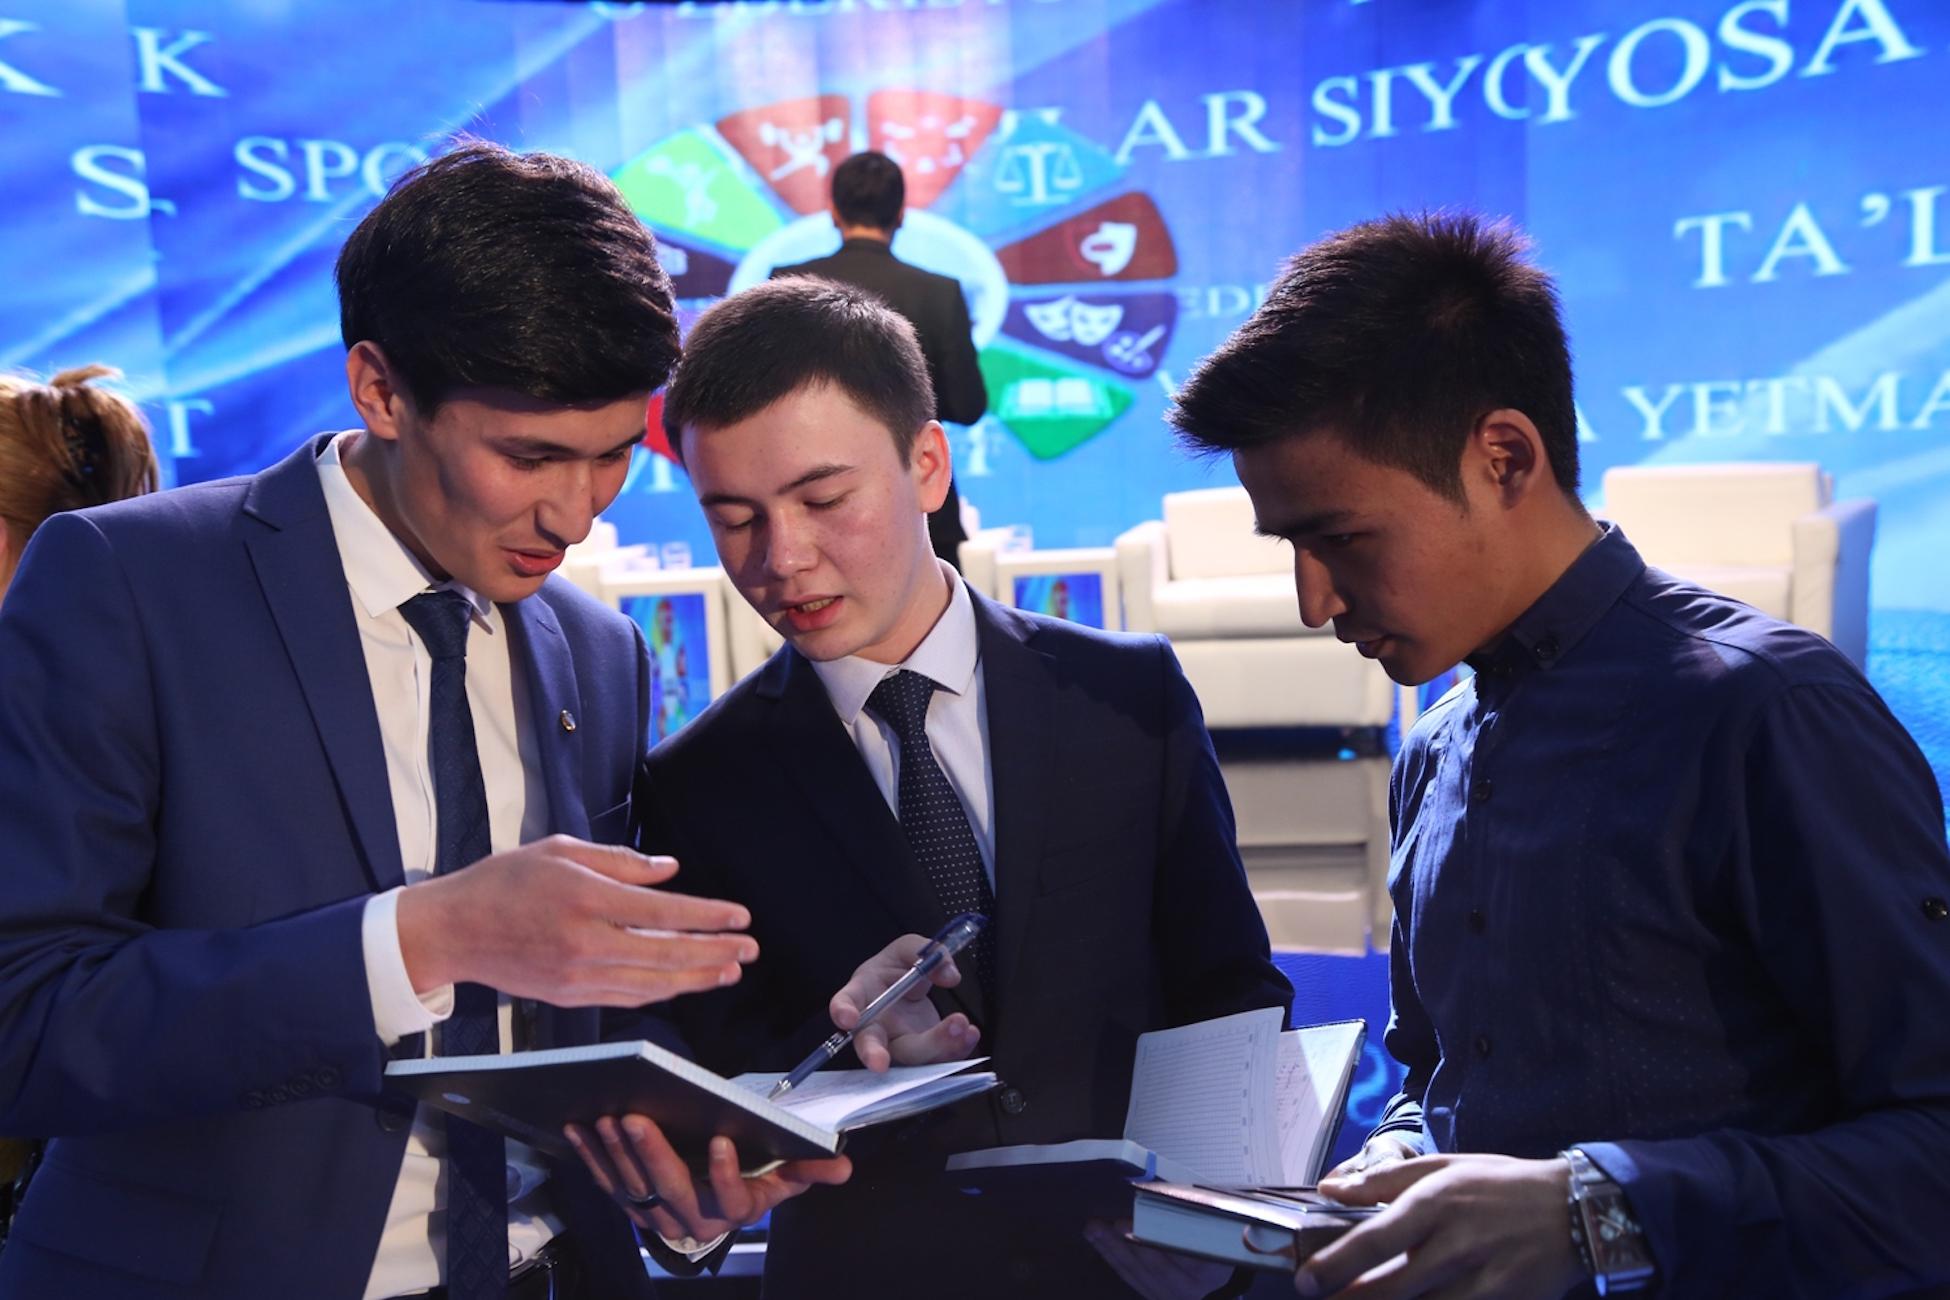 Uzbekistan offers 'safe internet' for youth